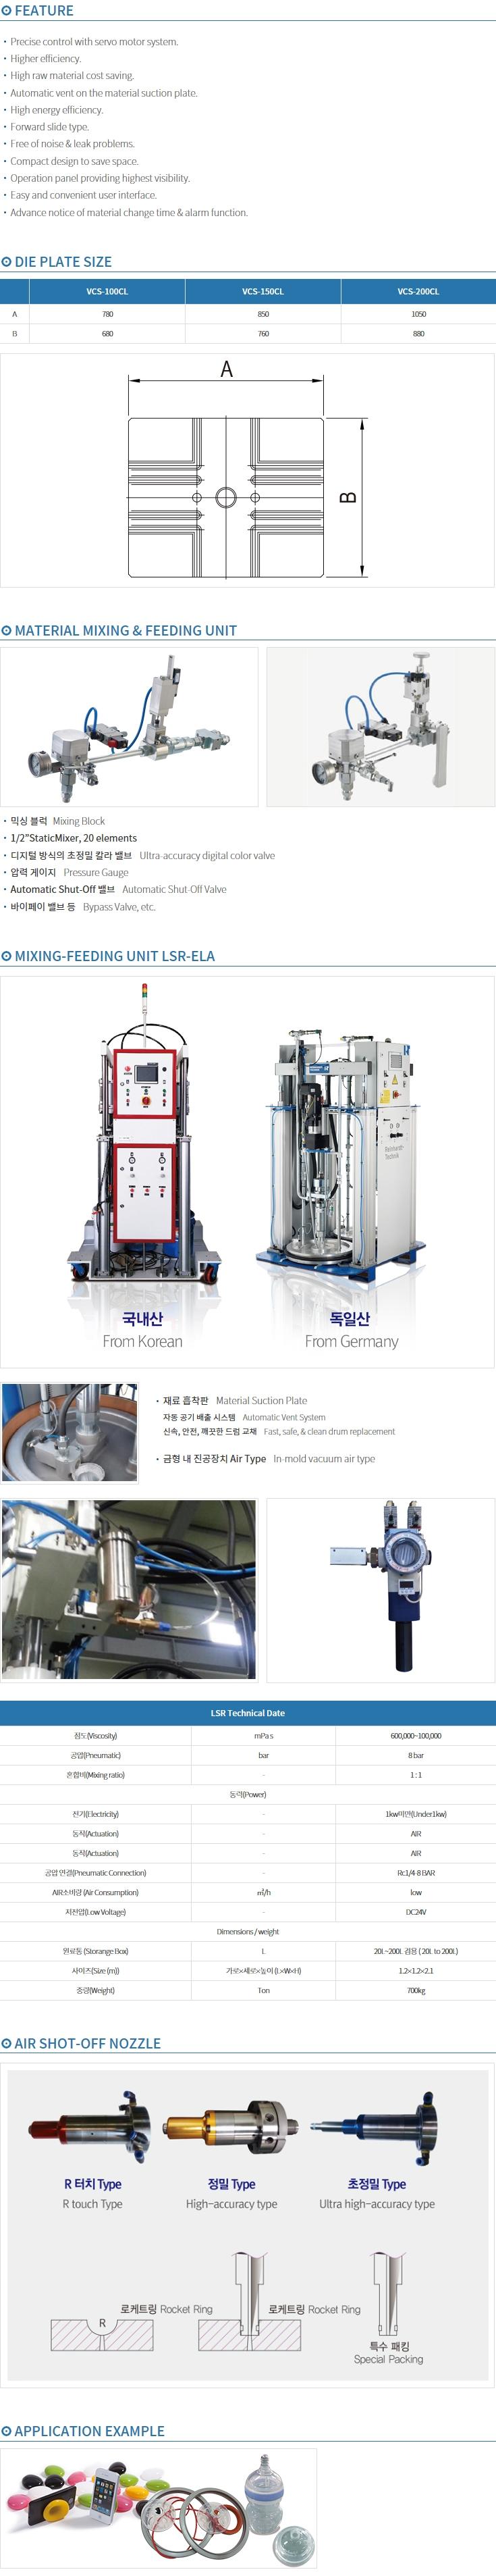 BMK For LSR Liquid Silicone SILICONERS Series